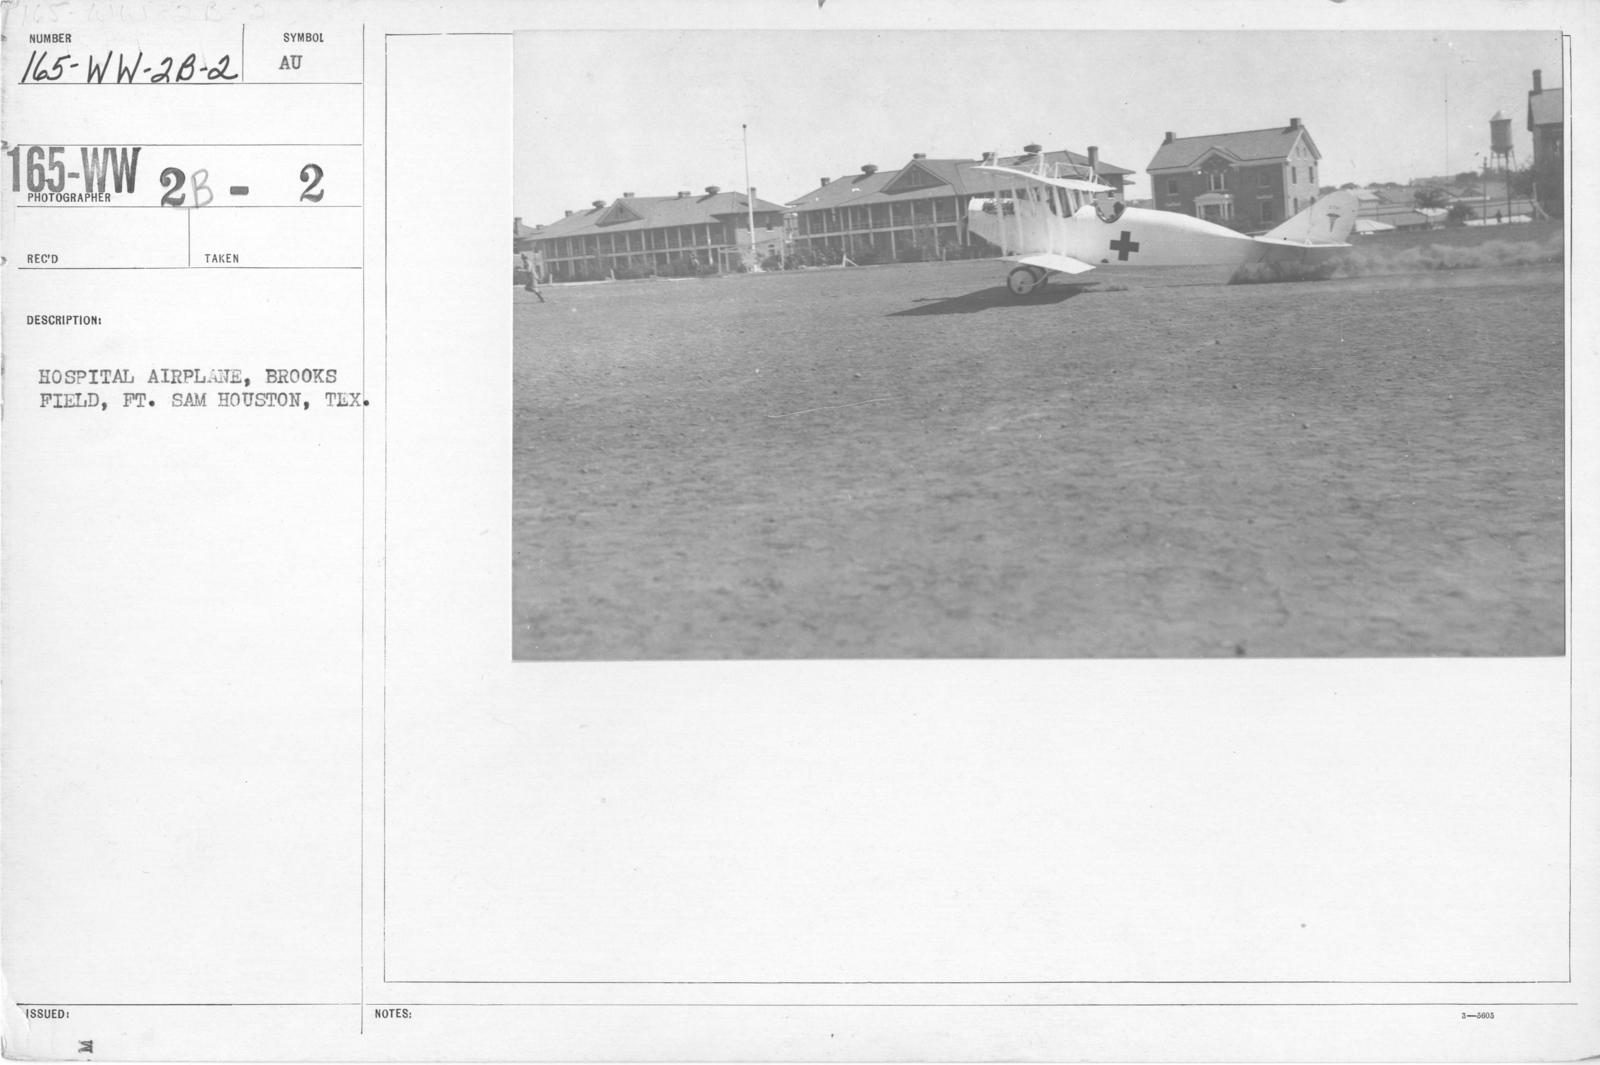 Airplanes - Ambulance - Hospital airplane, Brooks Field, Ft. Same Houston, Texas